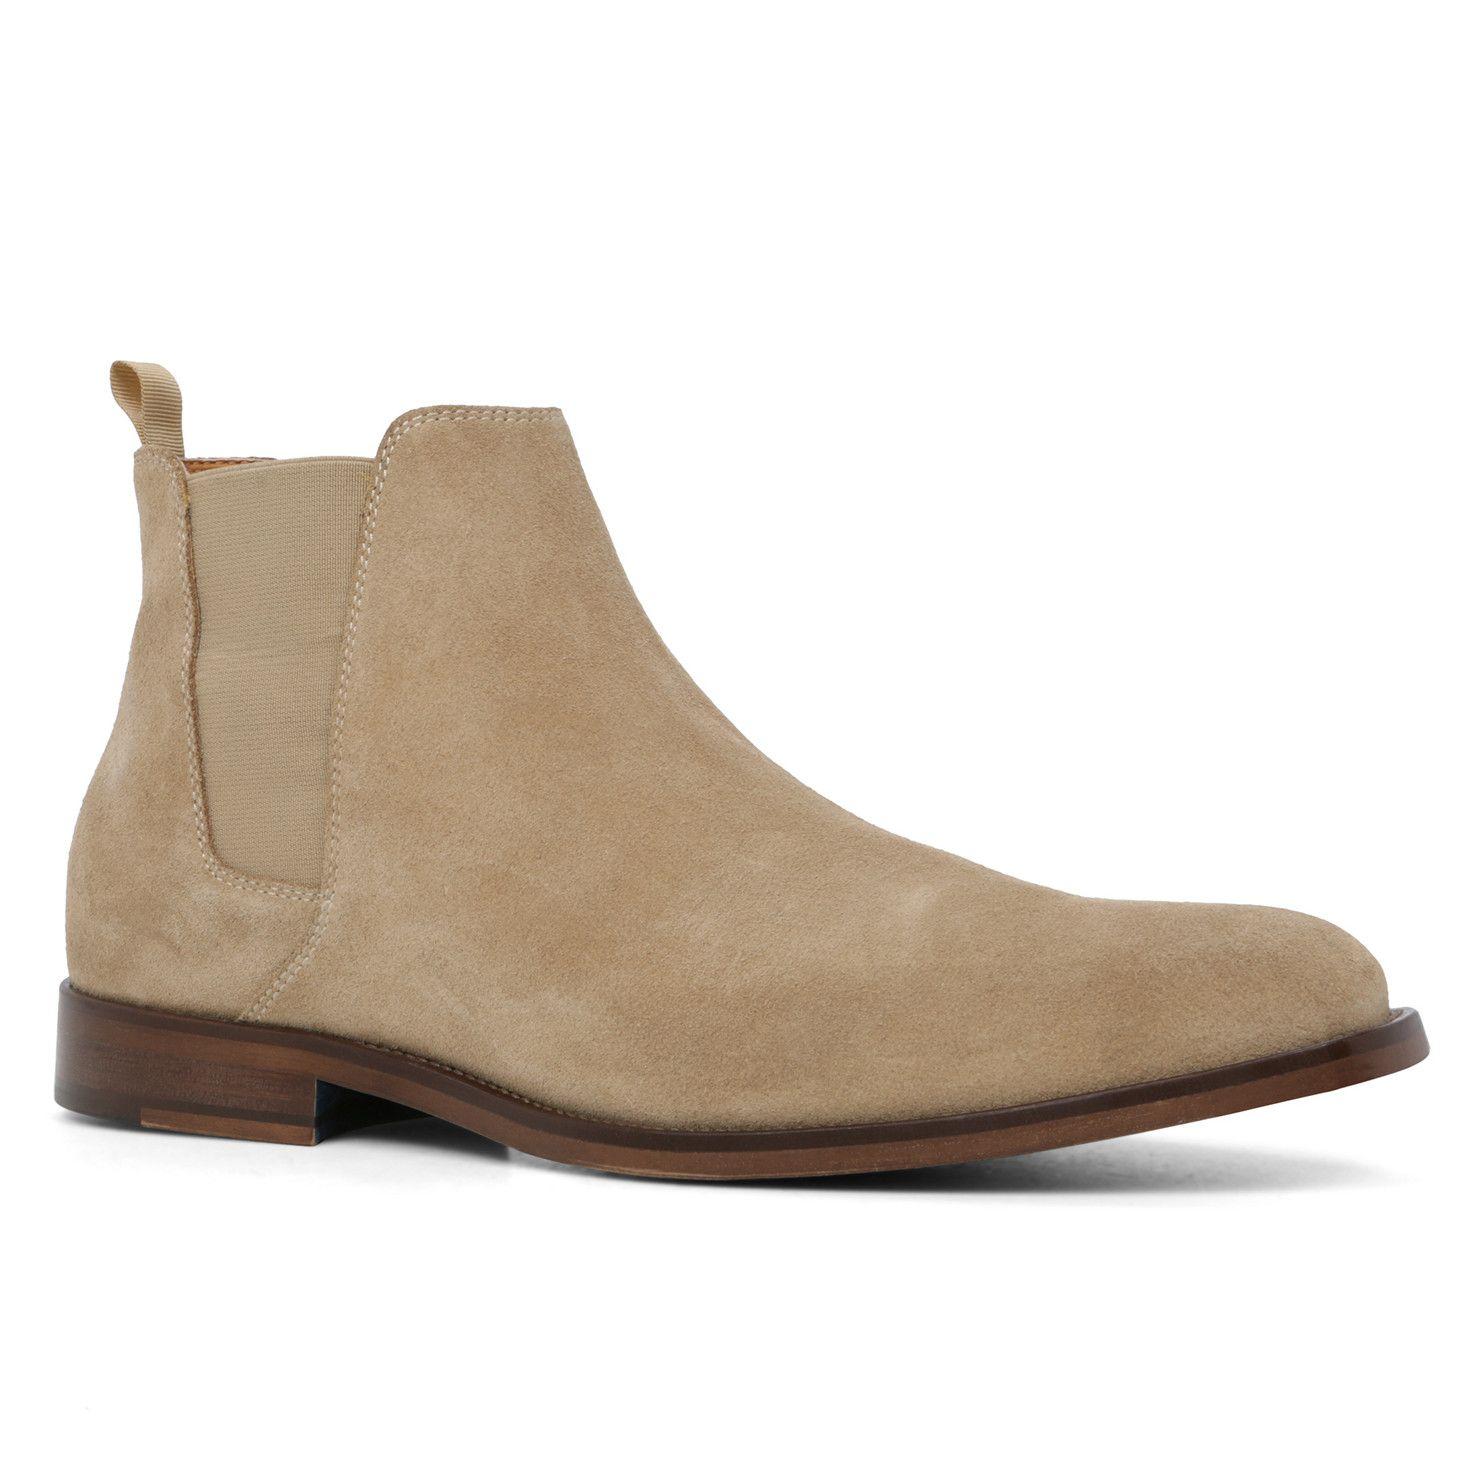 Buy Excellent Shoe Men ALDO Men s Vianello Leather Chelsea Boots Grey